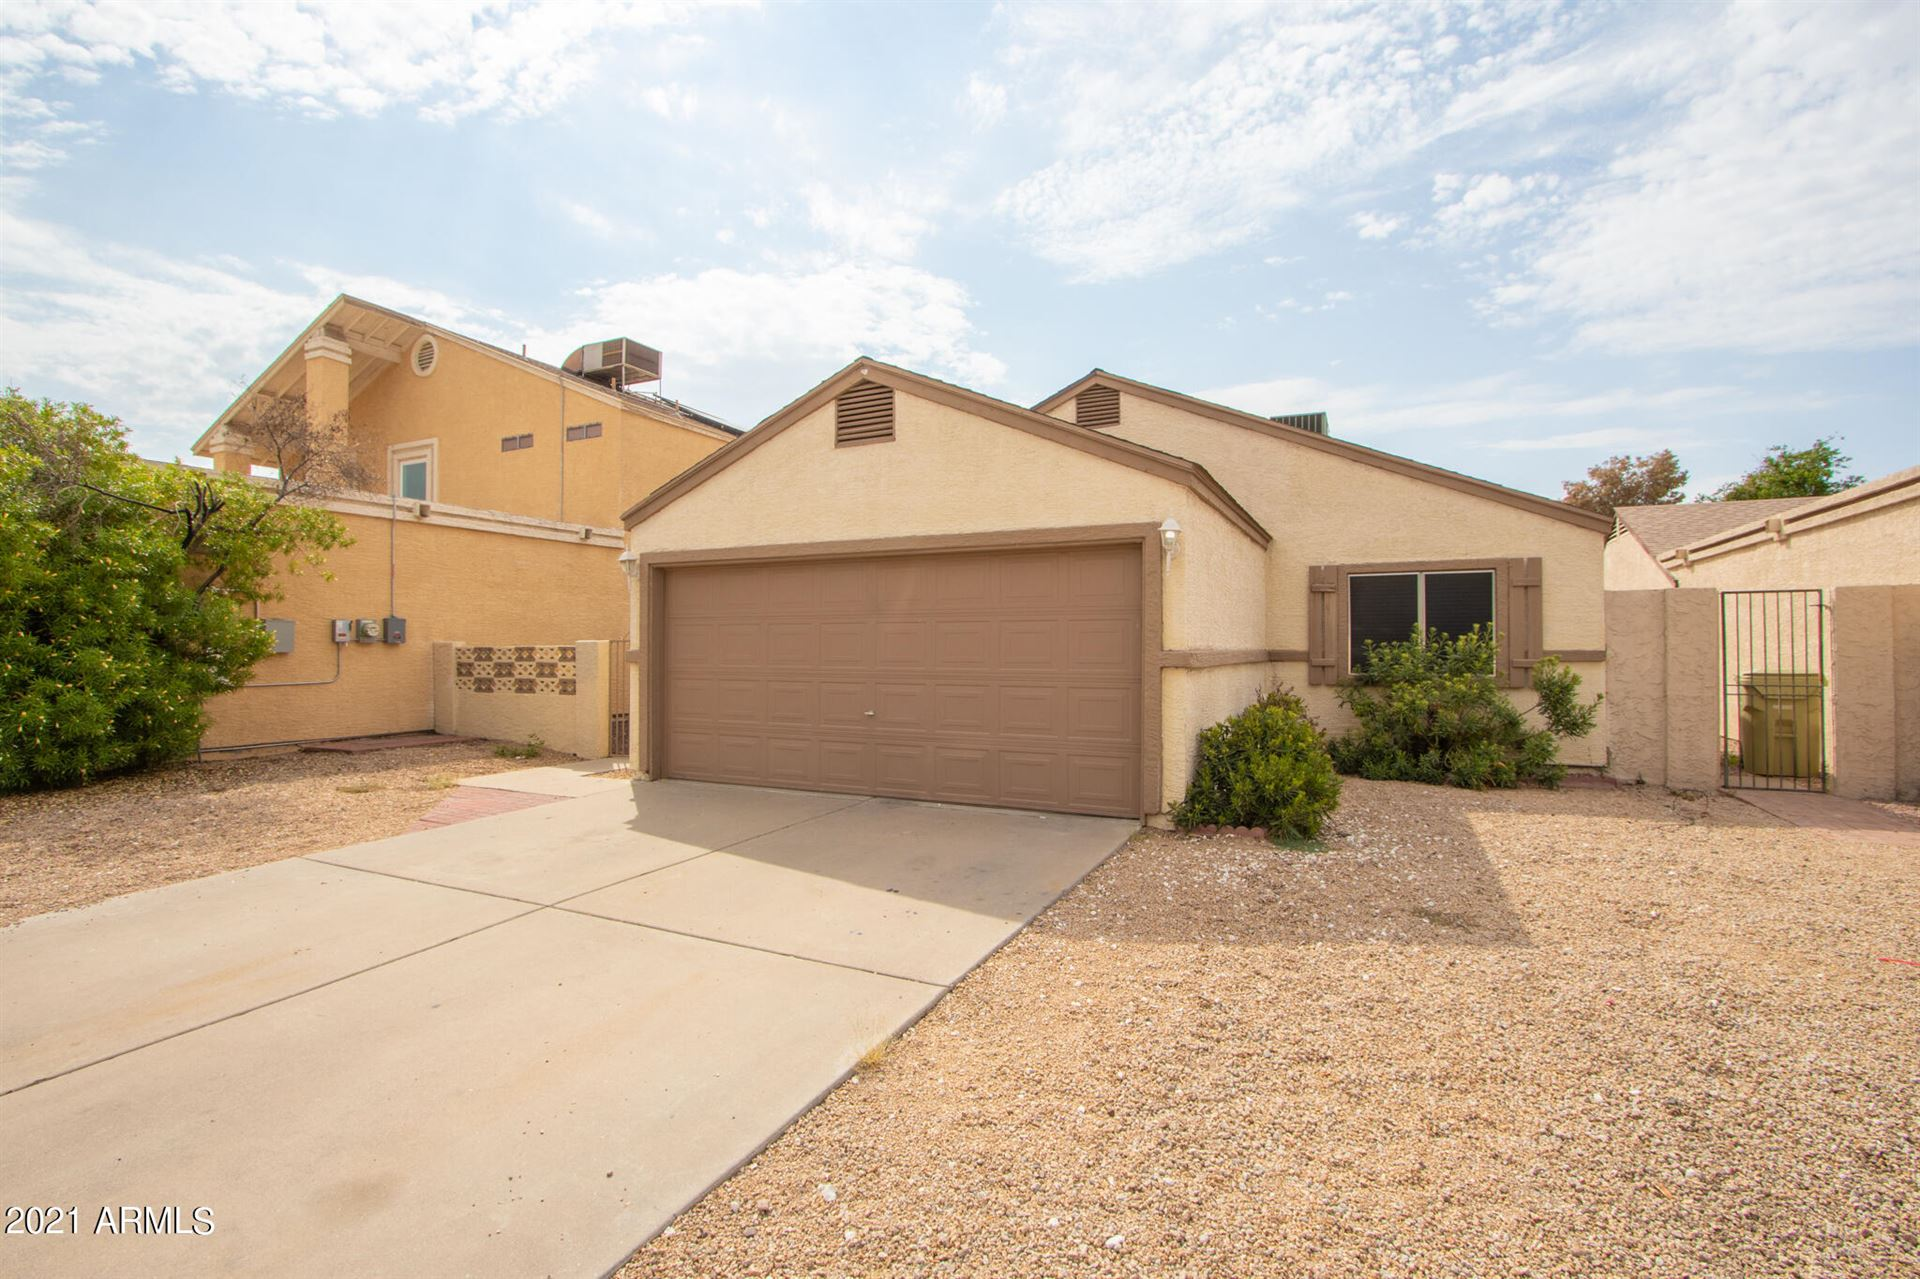 Photo of 6523 W Brown Street, Glendale, AZ 85302 (MLS # 6295934)